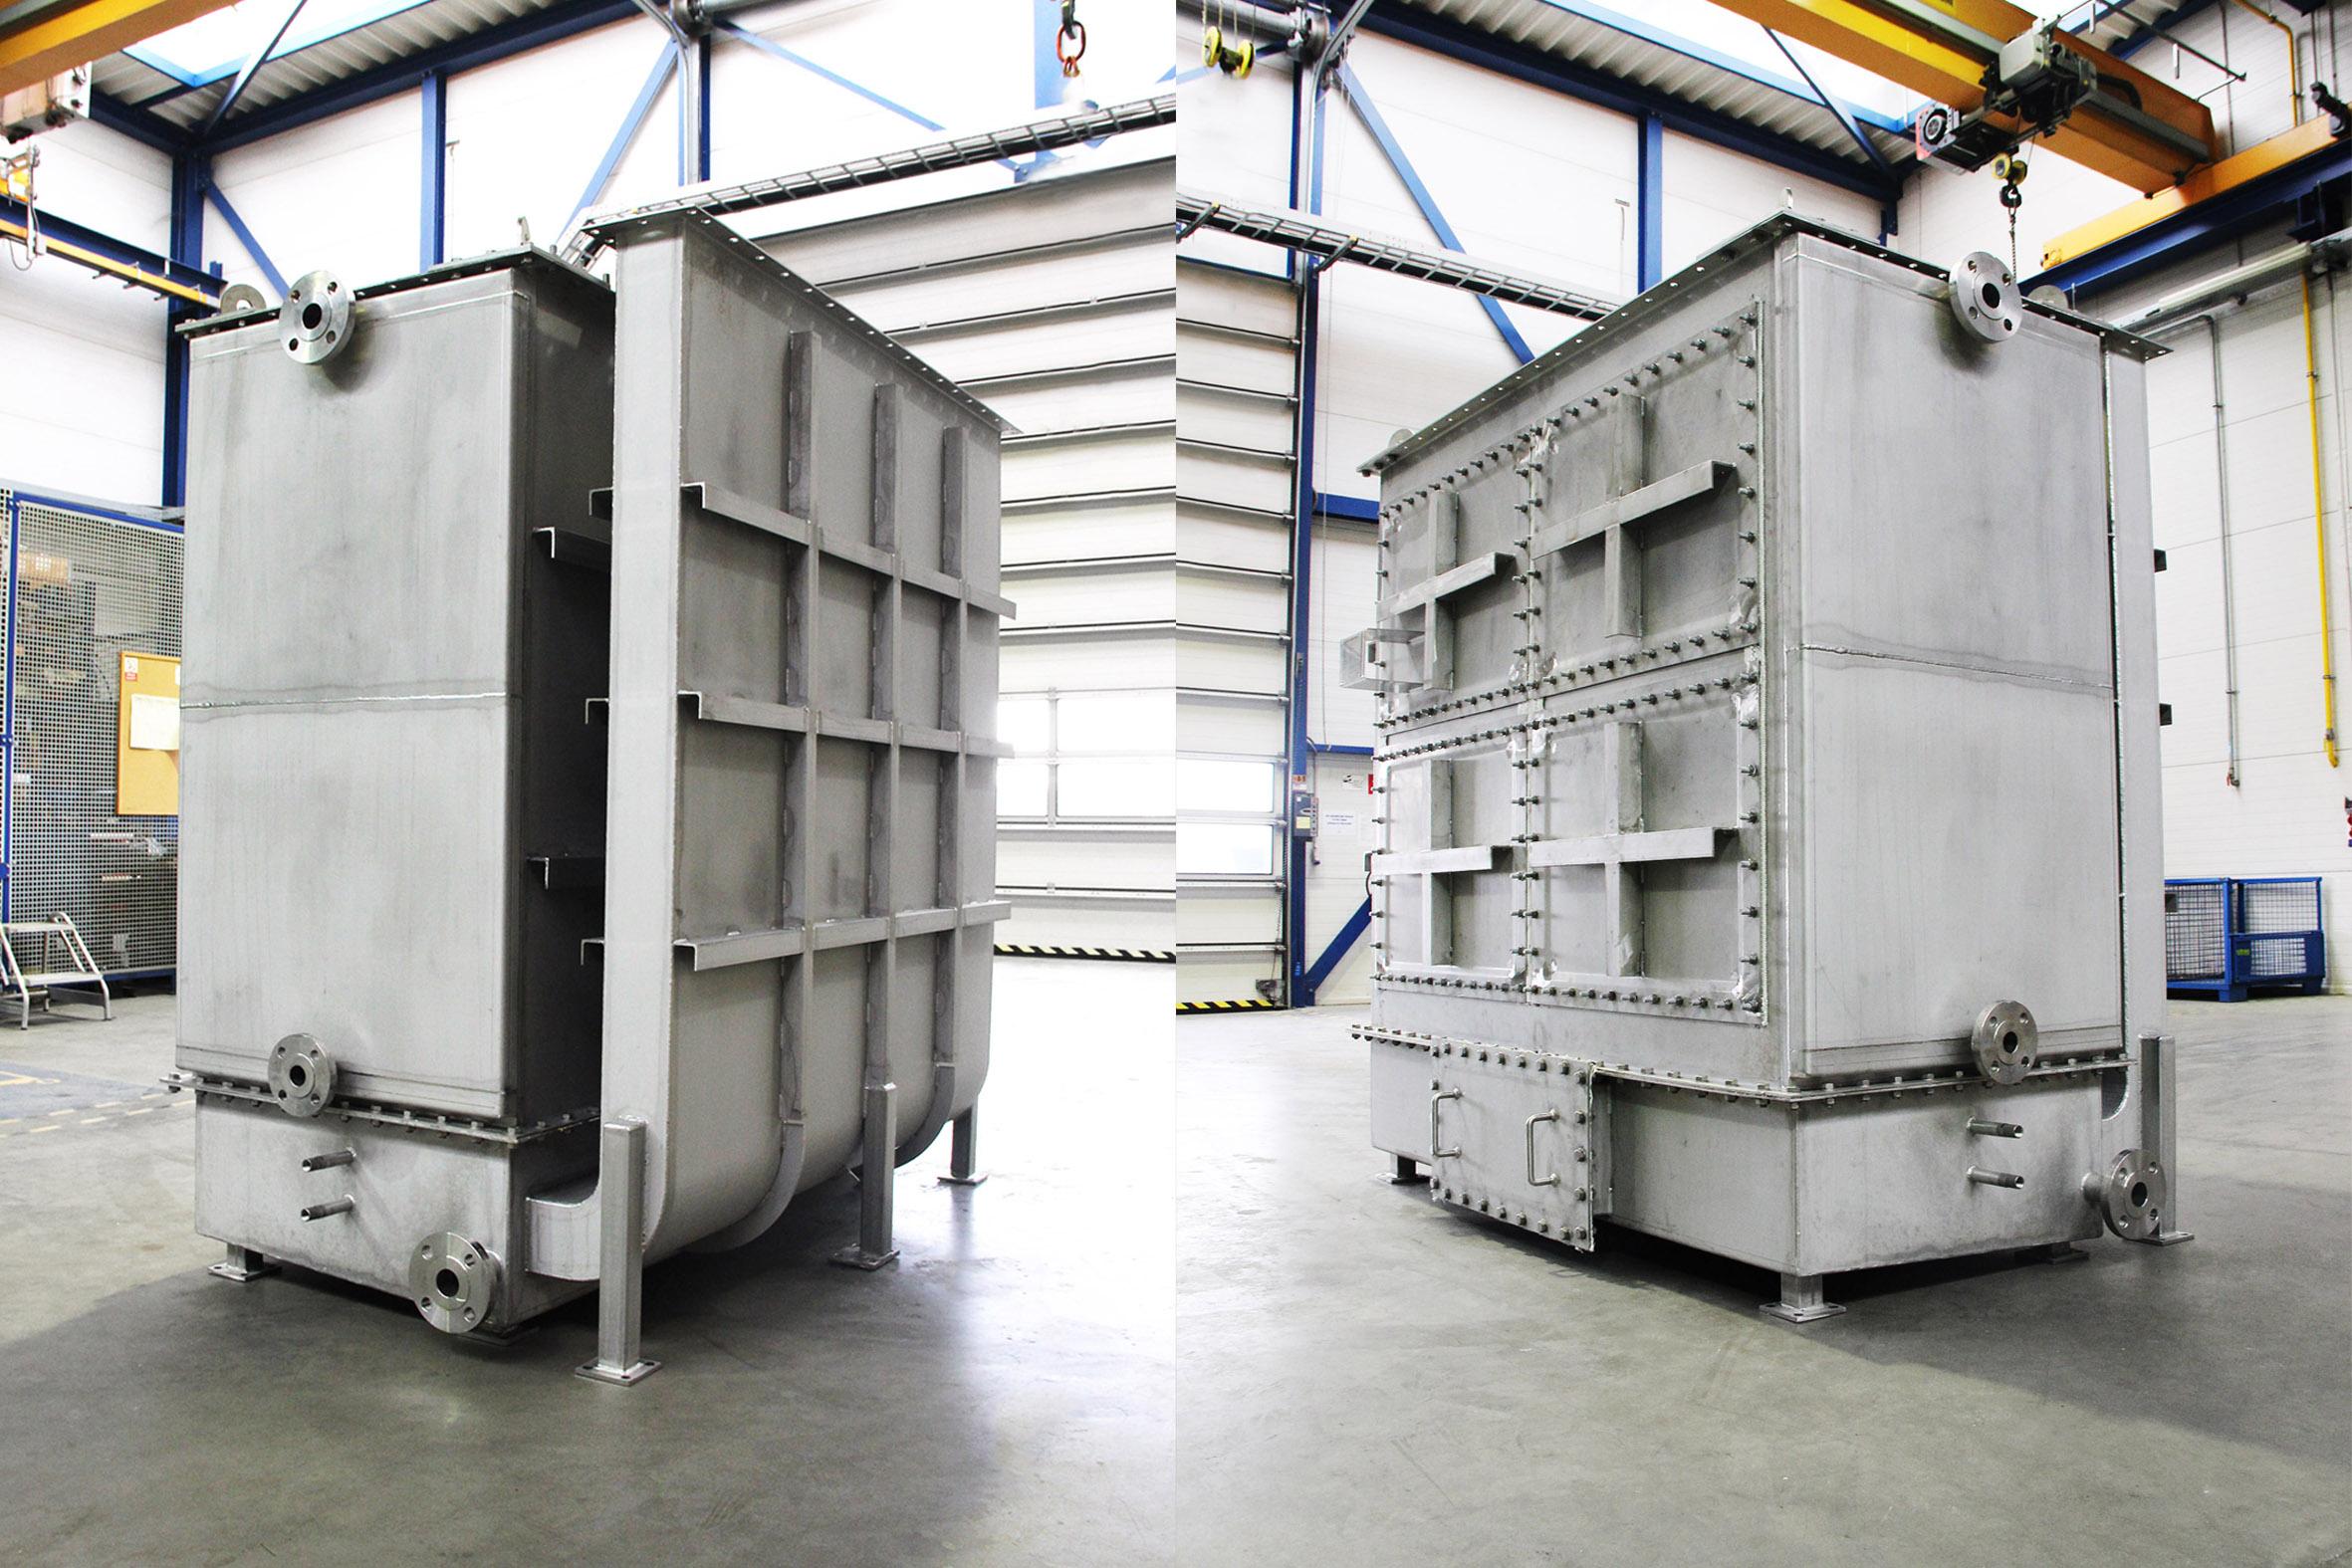 Toluene Evaporator for ORC system